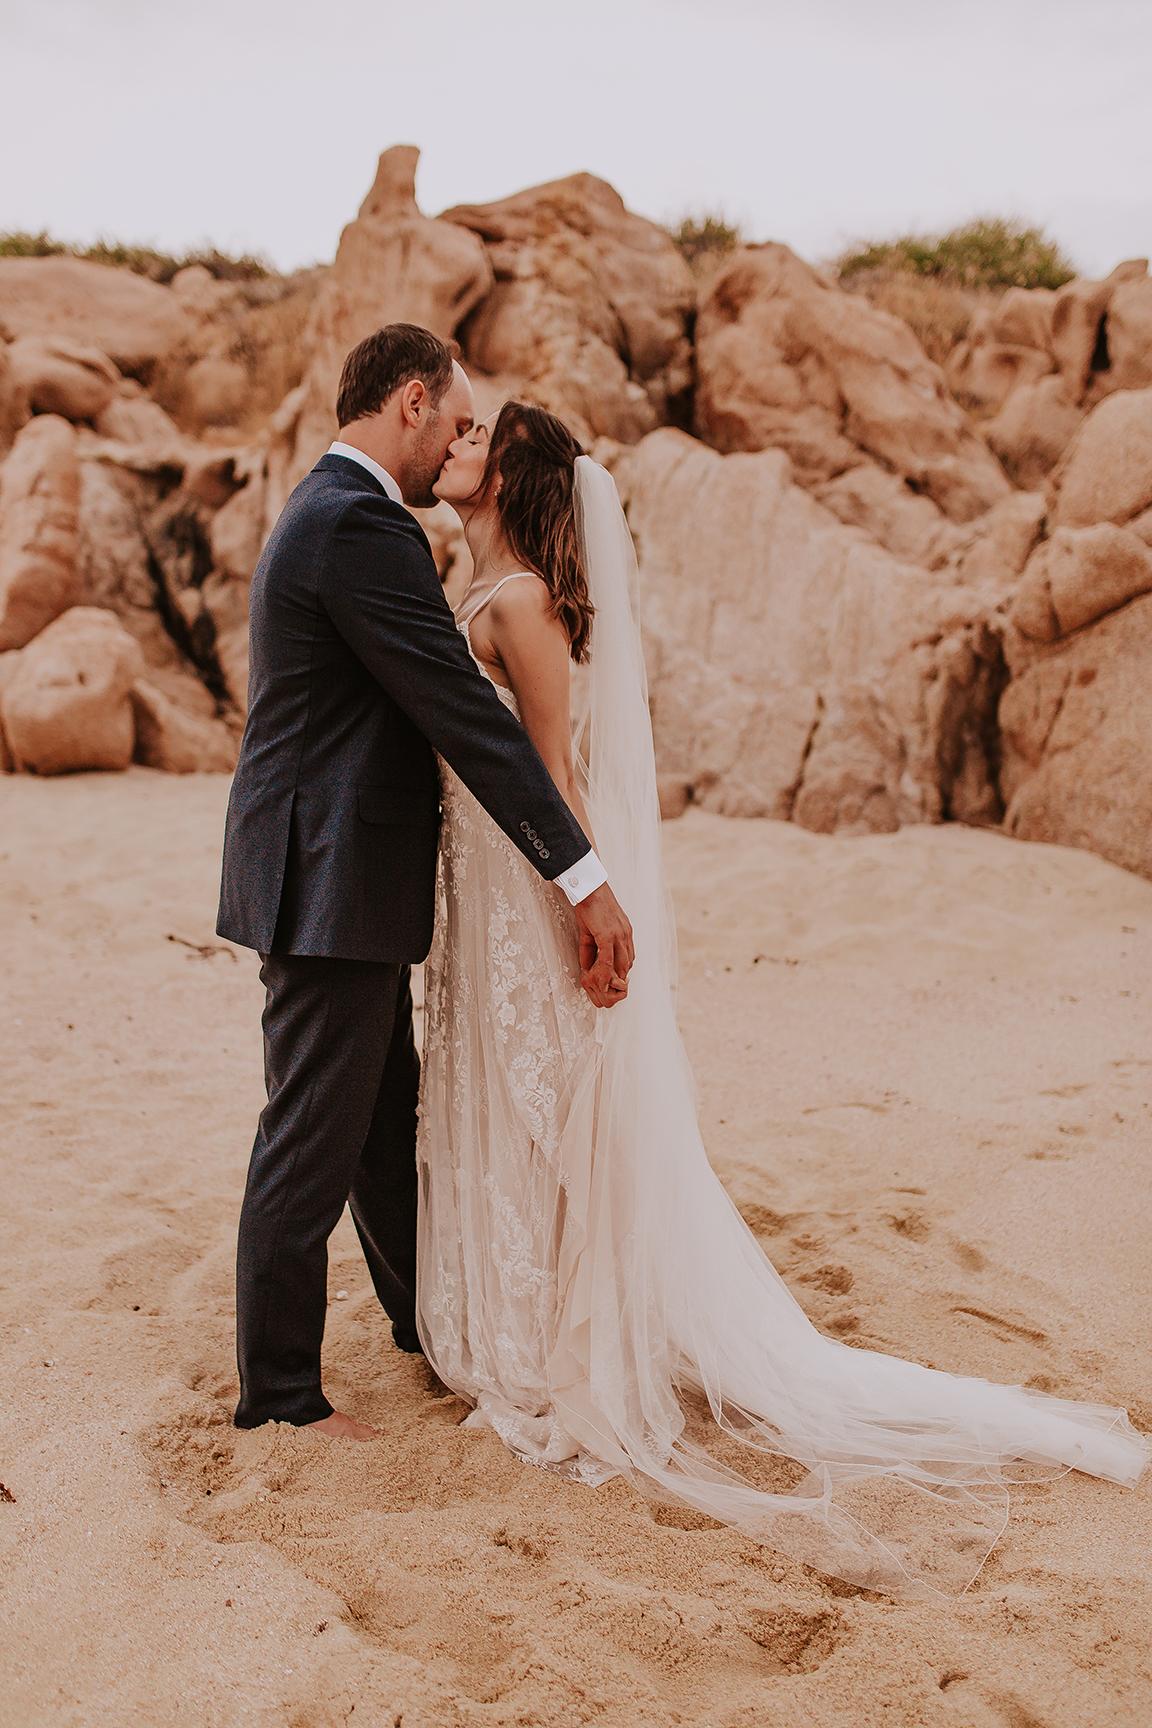 Lindsei+James_cabo_wedding_891.jpg